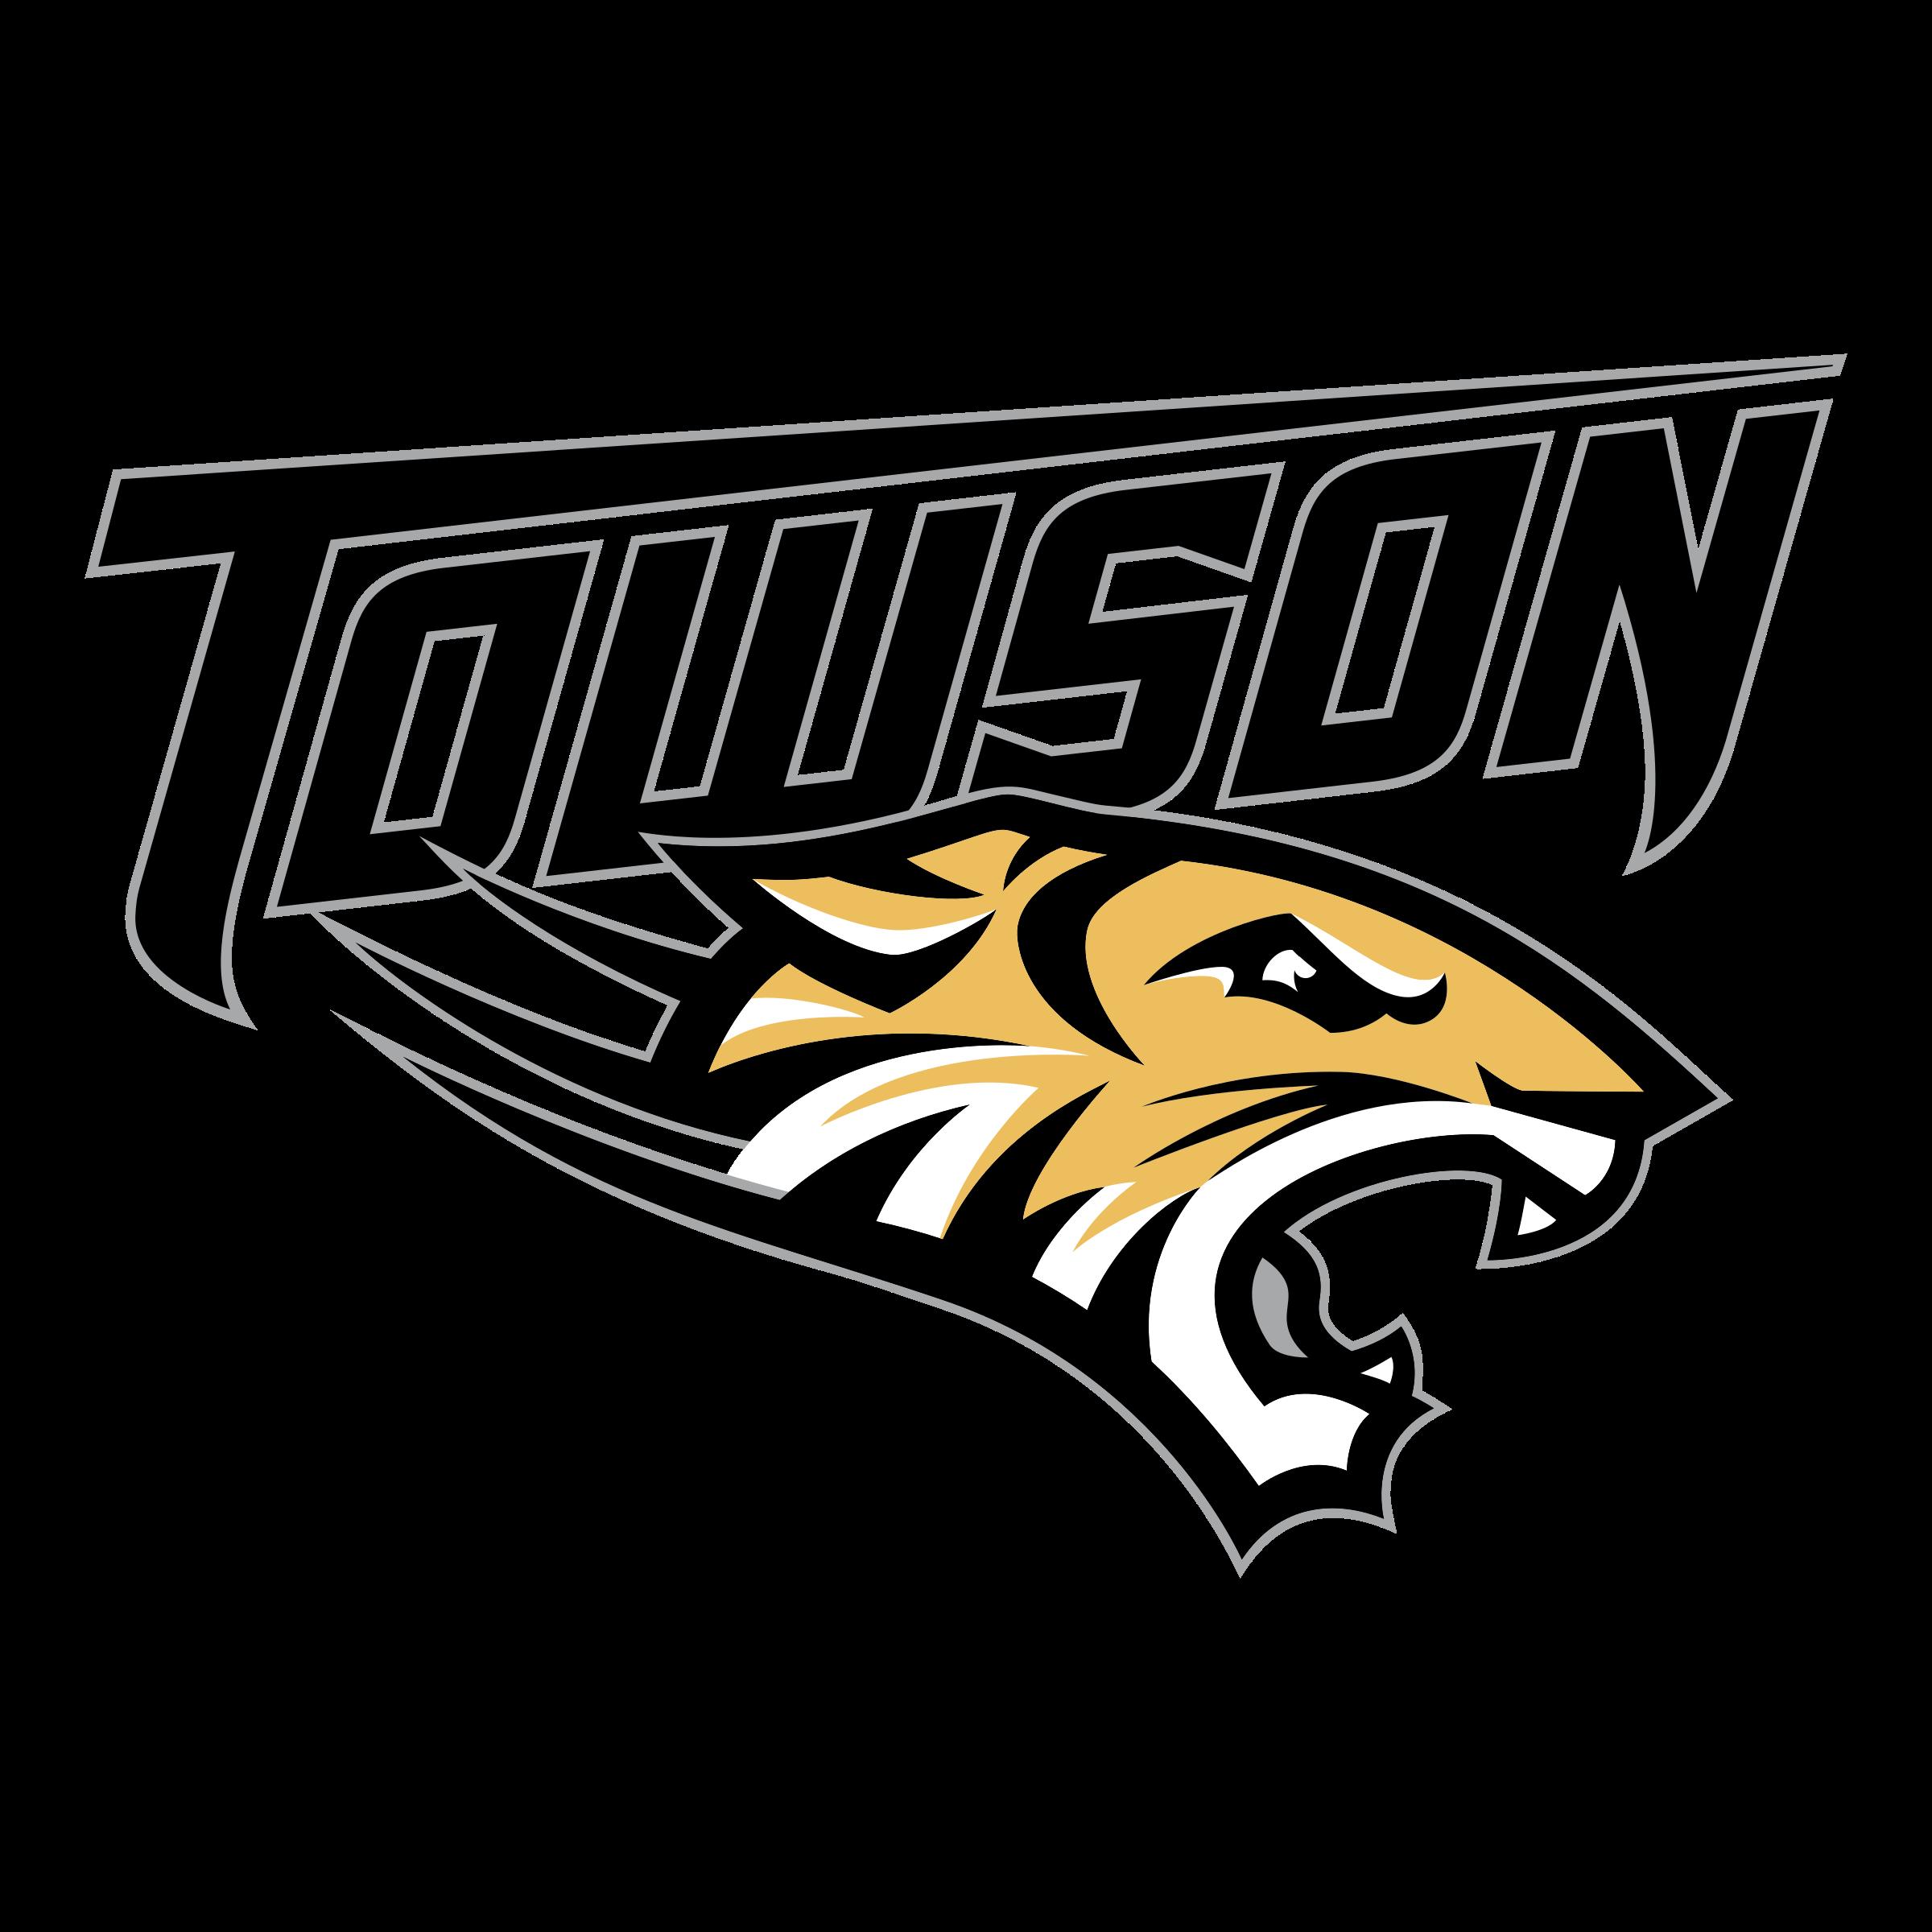 Team logo 265